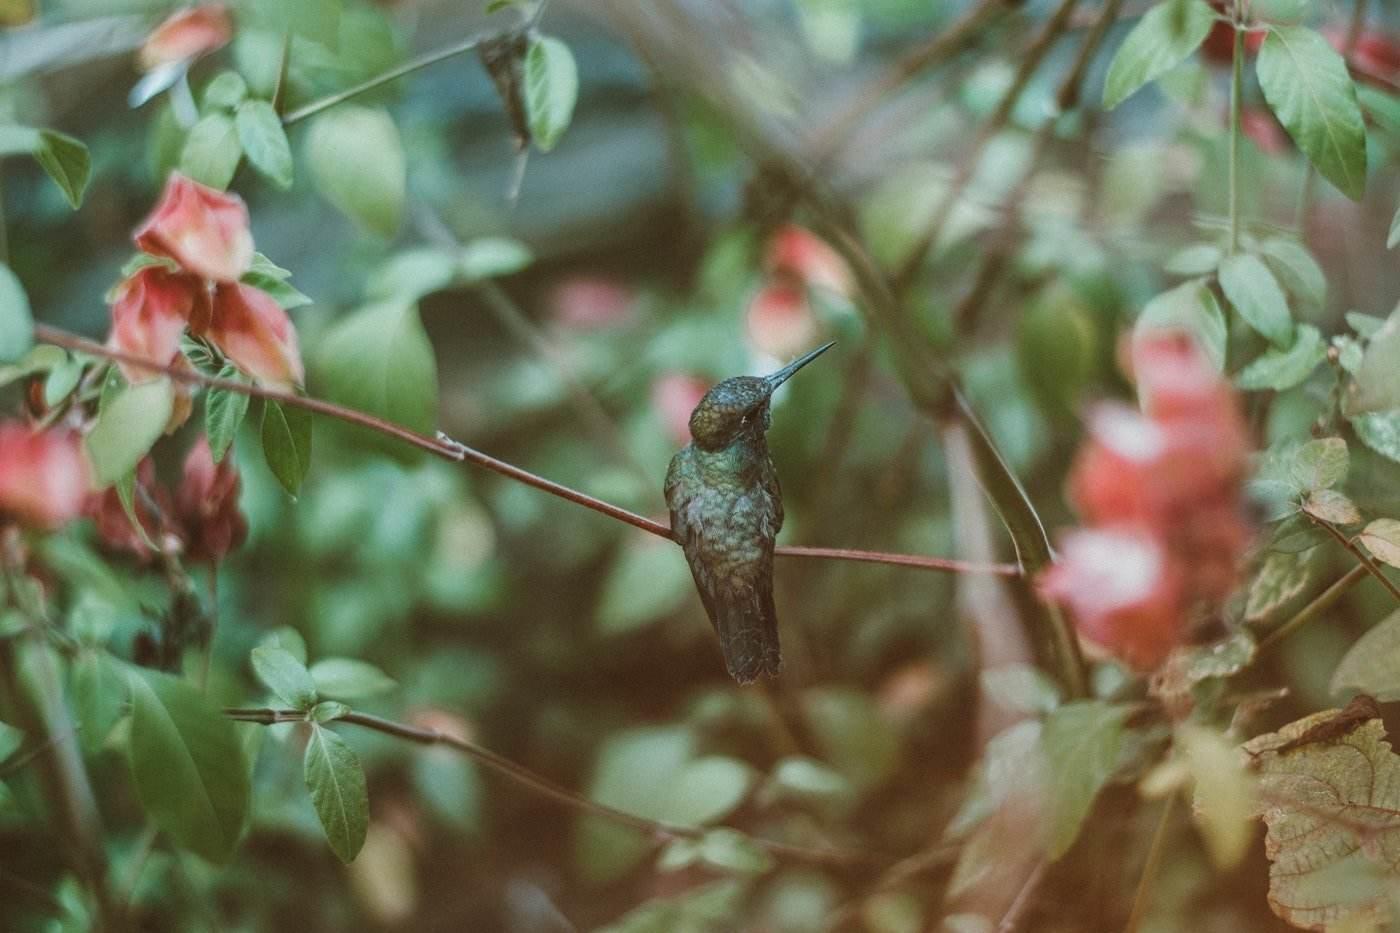 hummingbird in tree - how to attract wildlife to your garden